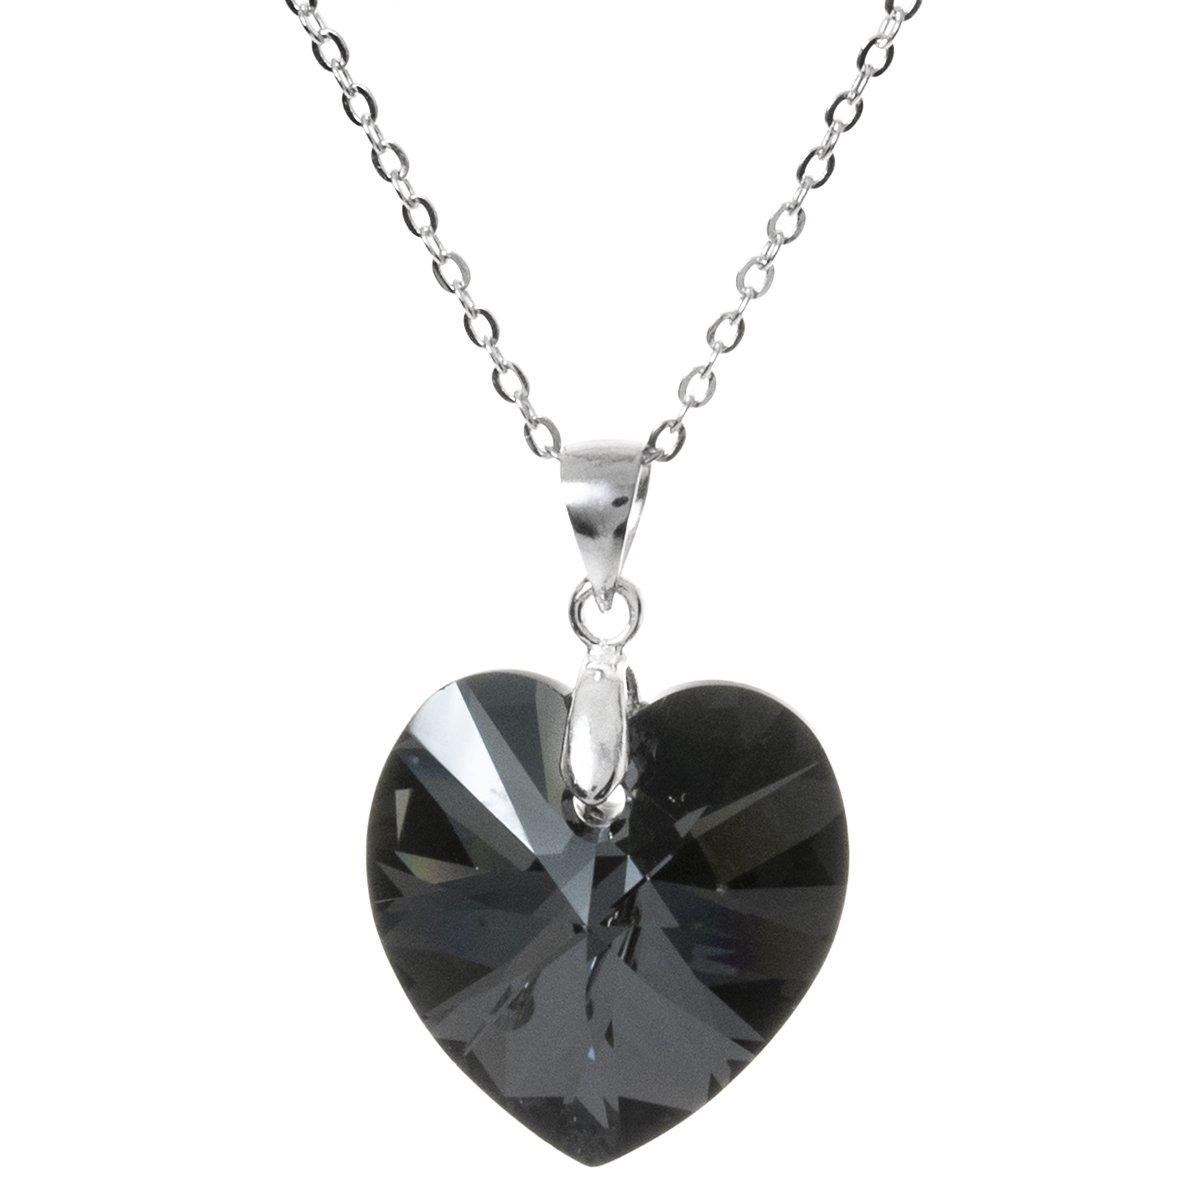 263e37fc5 Amazon.com: Dreambell Swarovski Elements Heart Silver Night Crystal Pendant  w/Rhodium Sterling Silver Adjustable Necklace 16